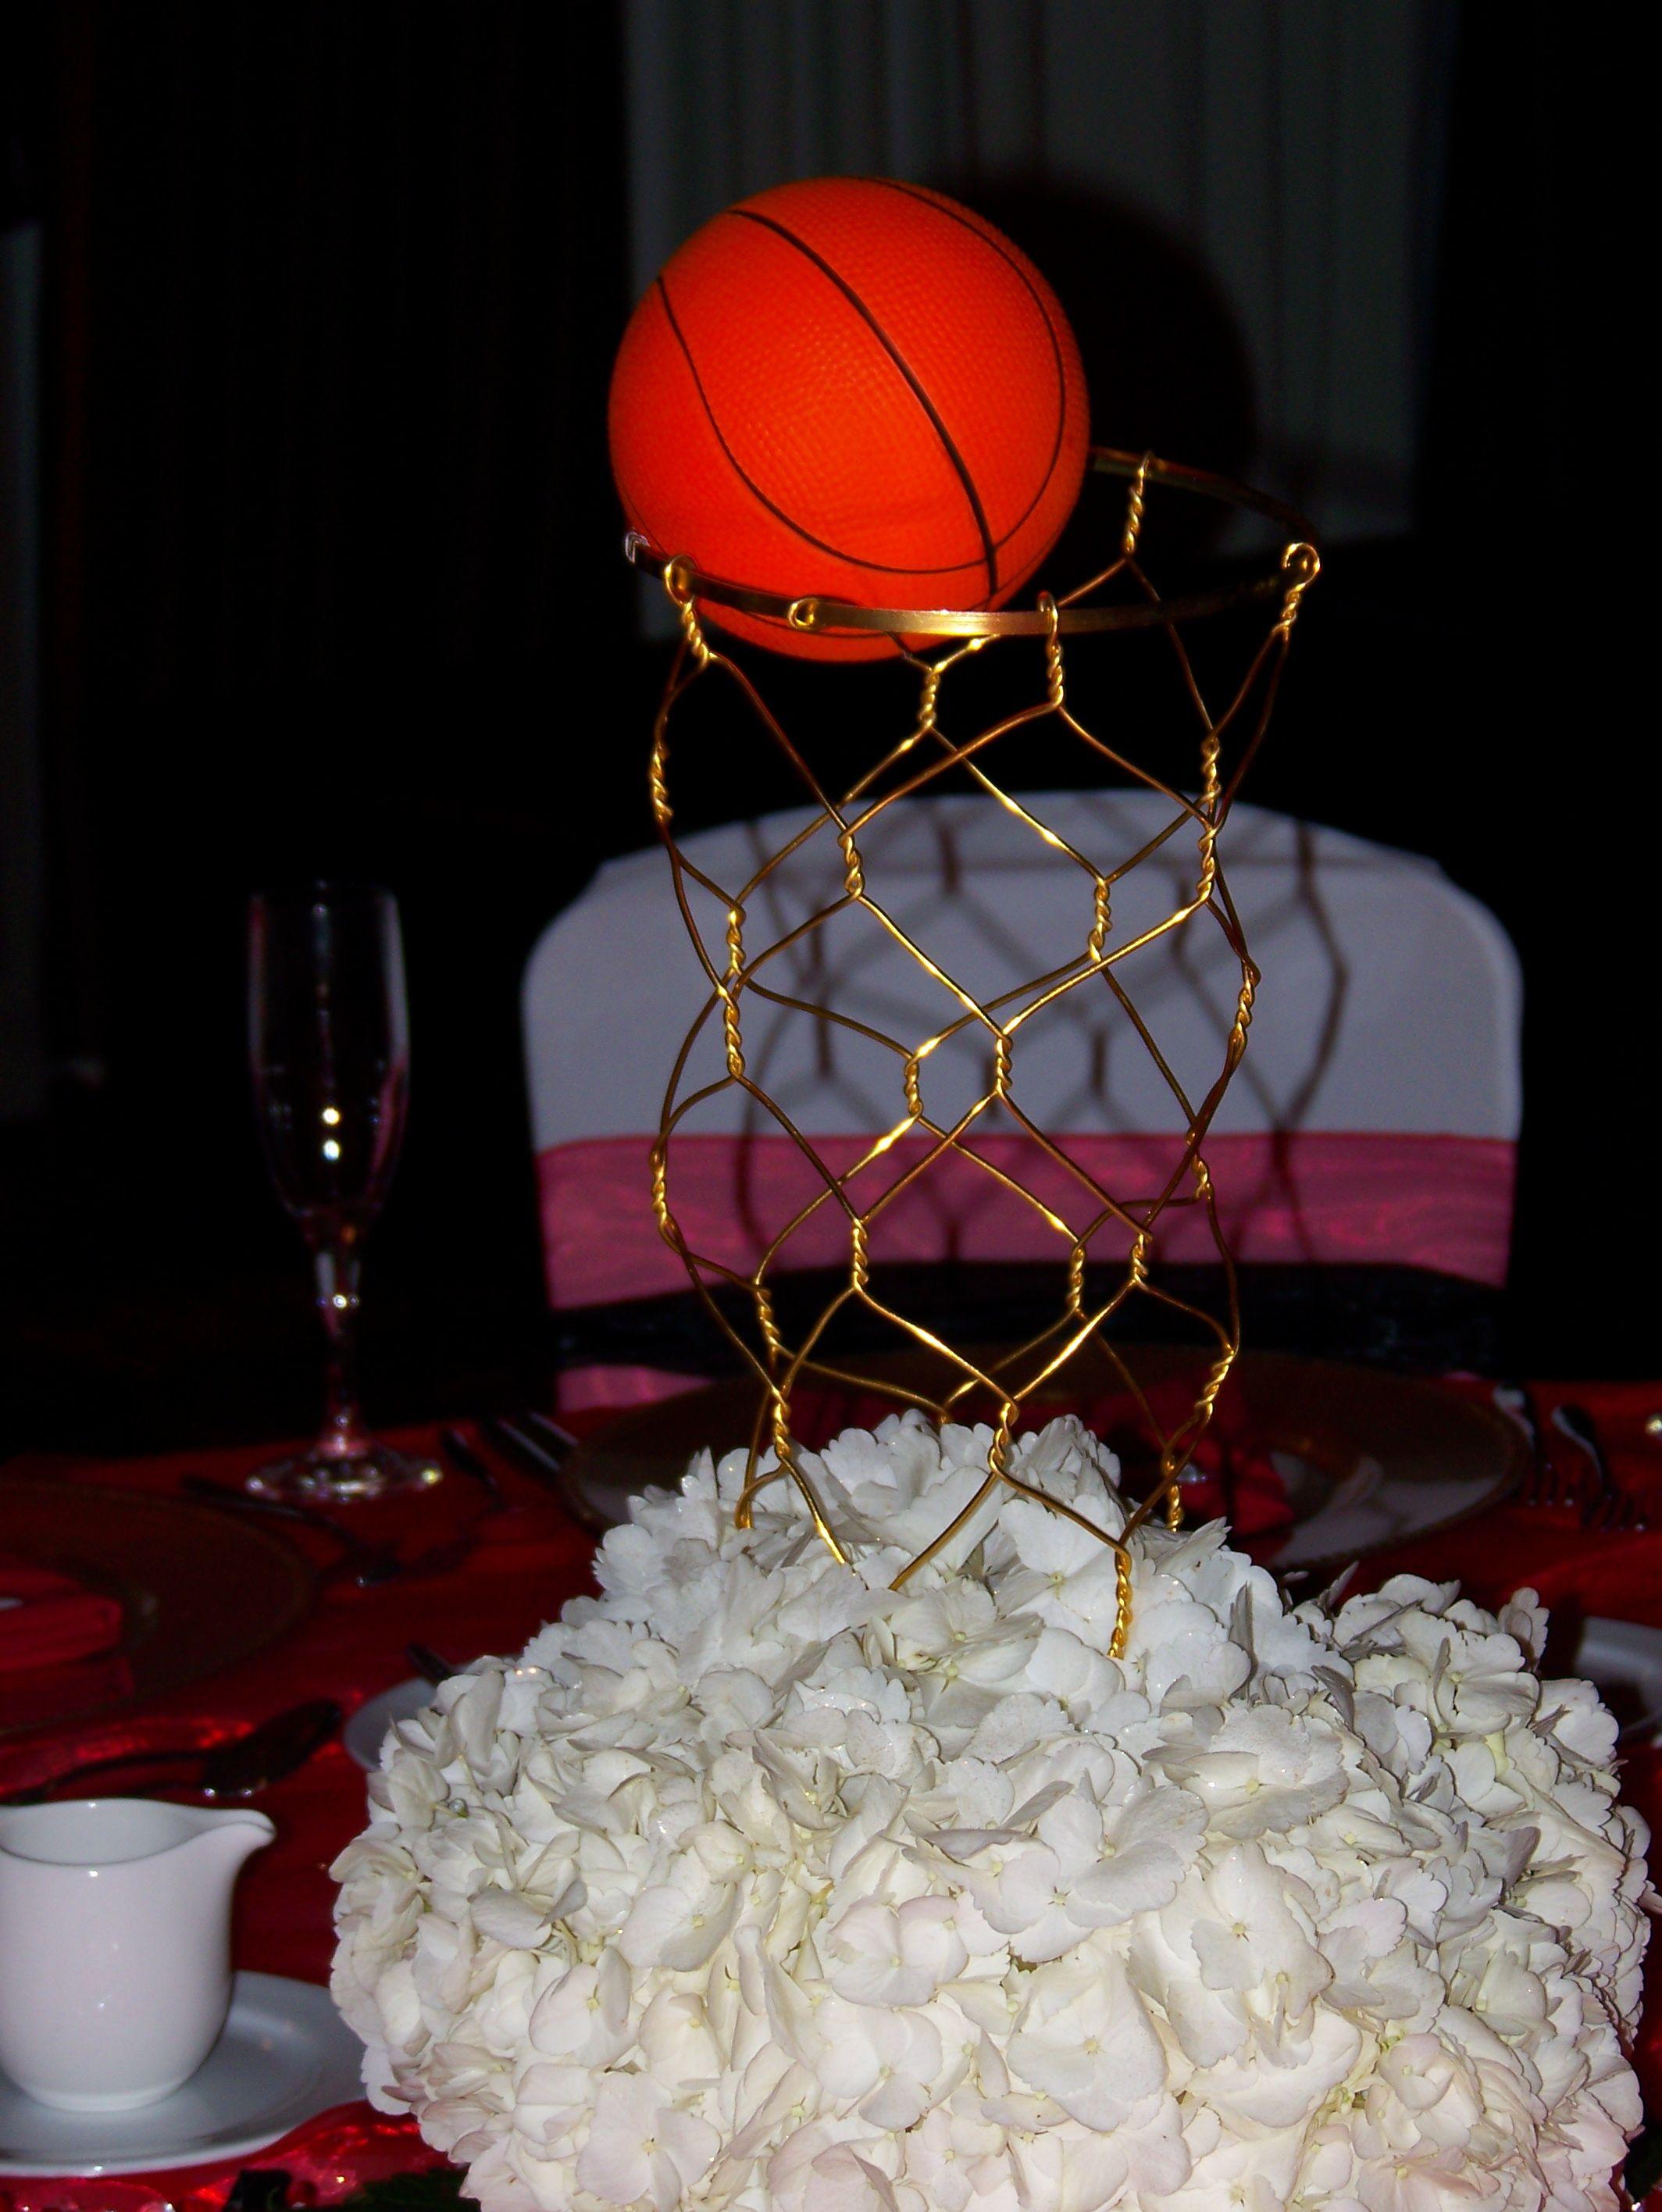 Basketball theme centerpiece party ideas pinterest